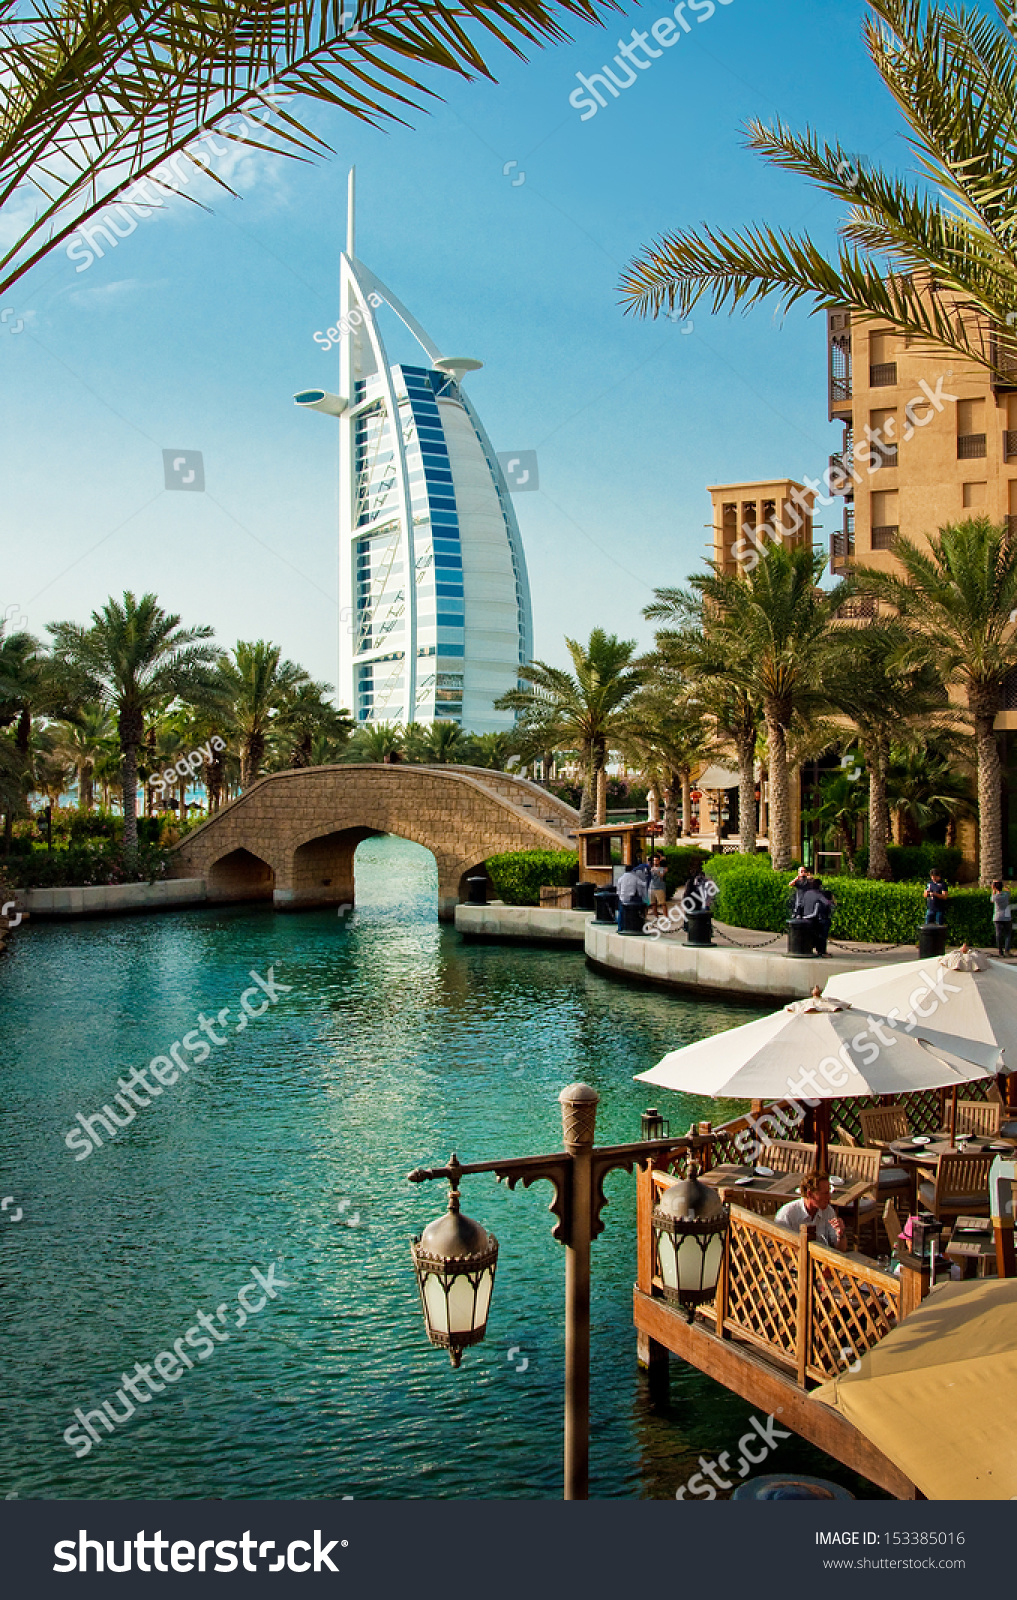 Dubai june 3 famous hotel tourist stock photo 153385016 for The famous hotel in dubai